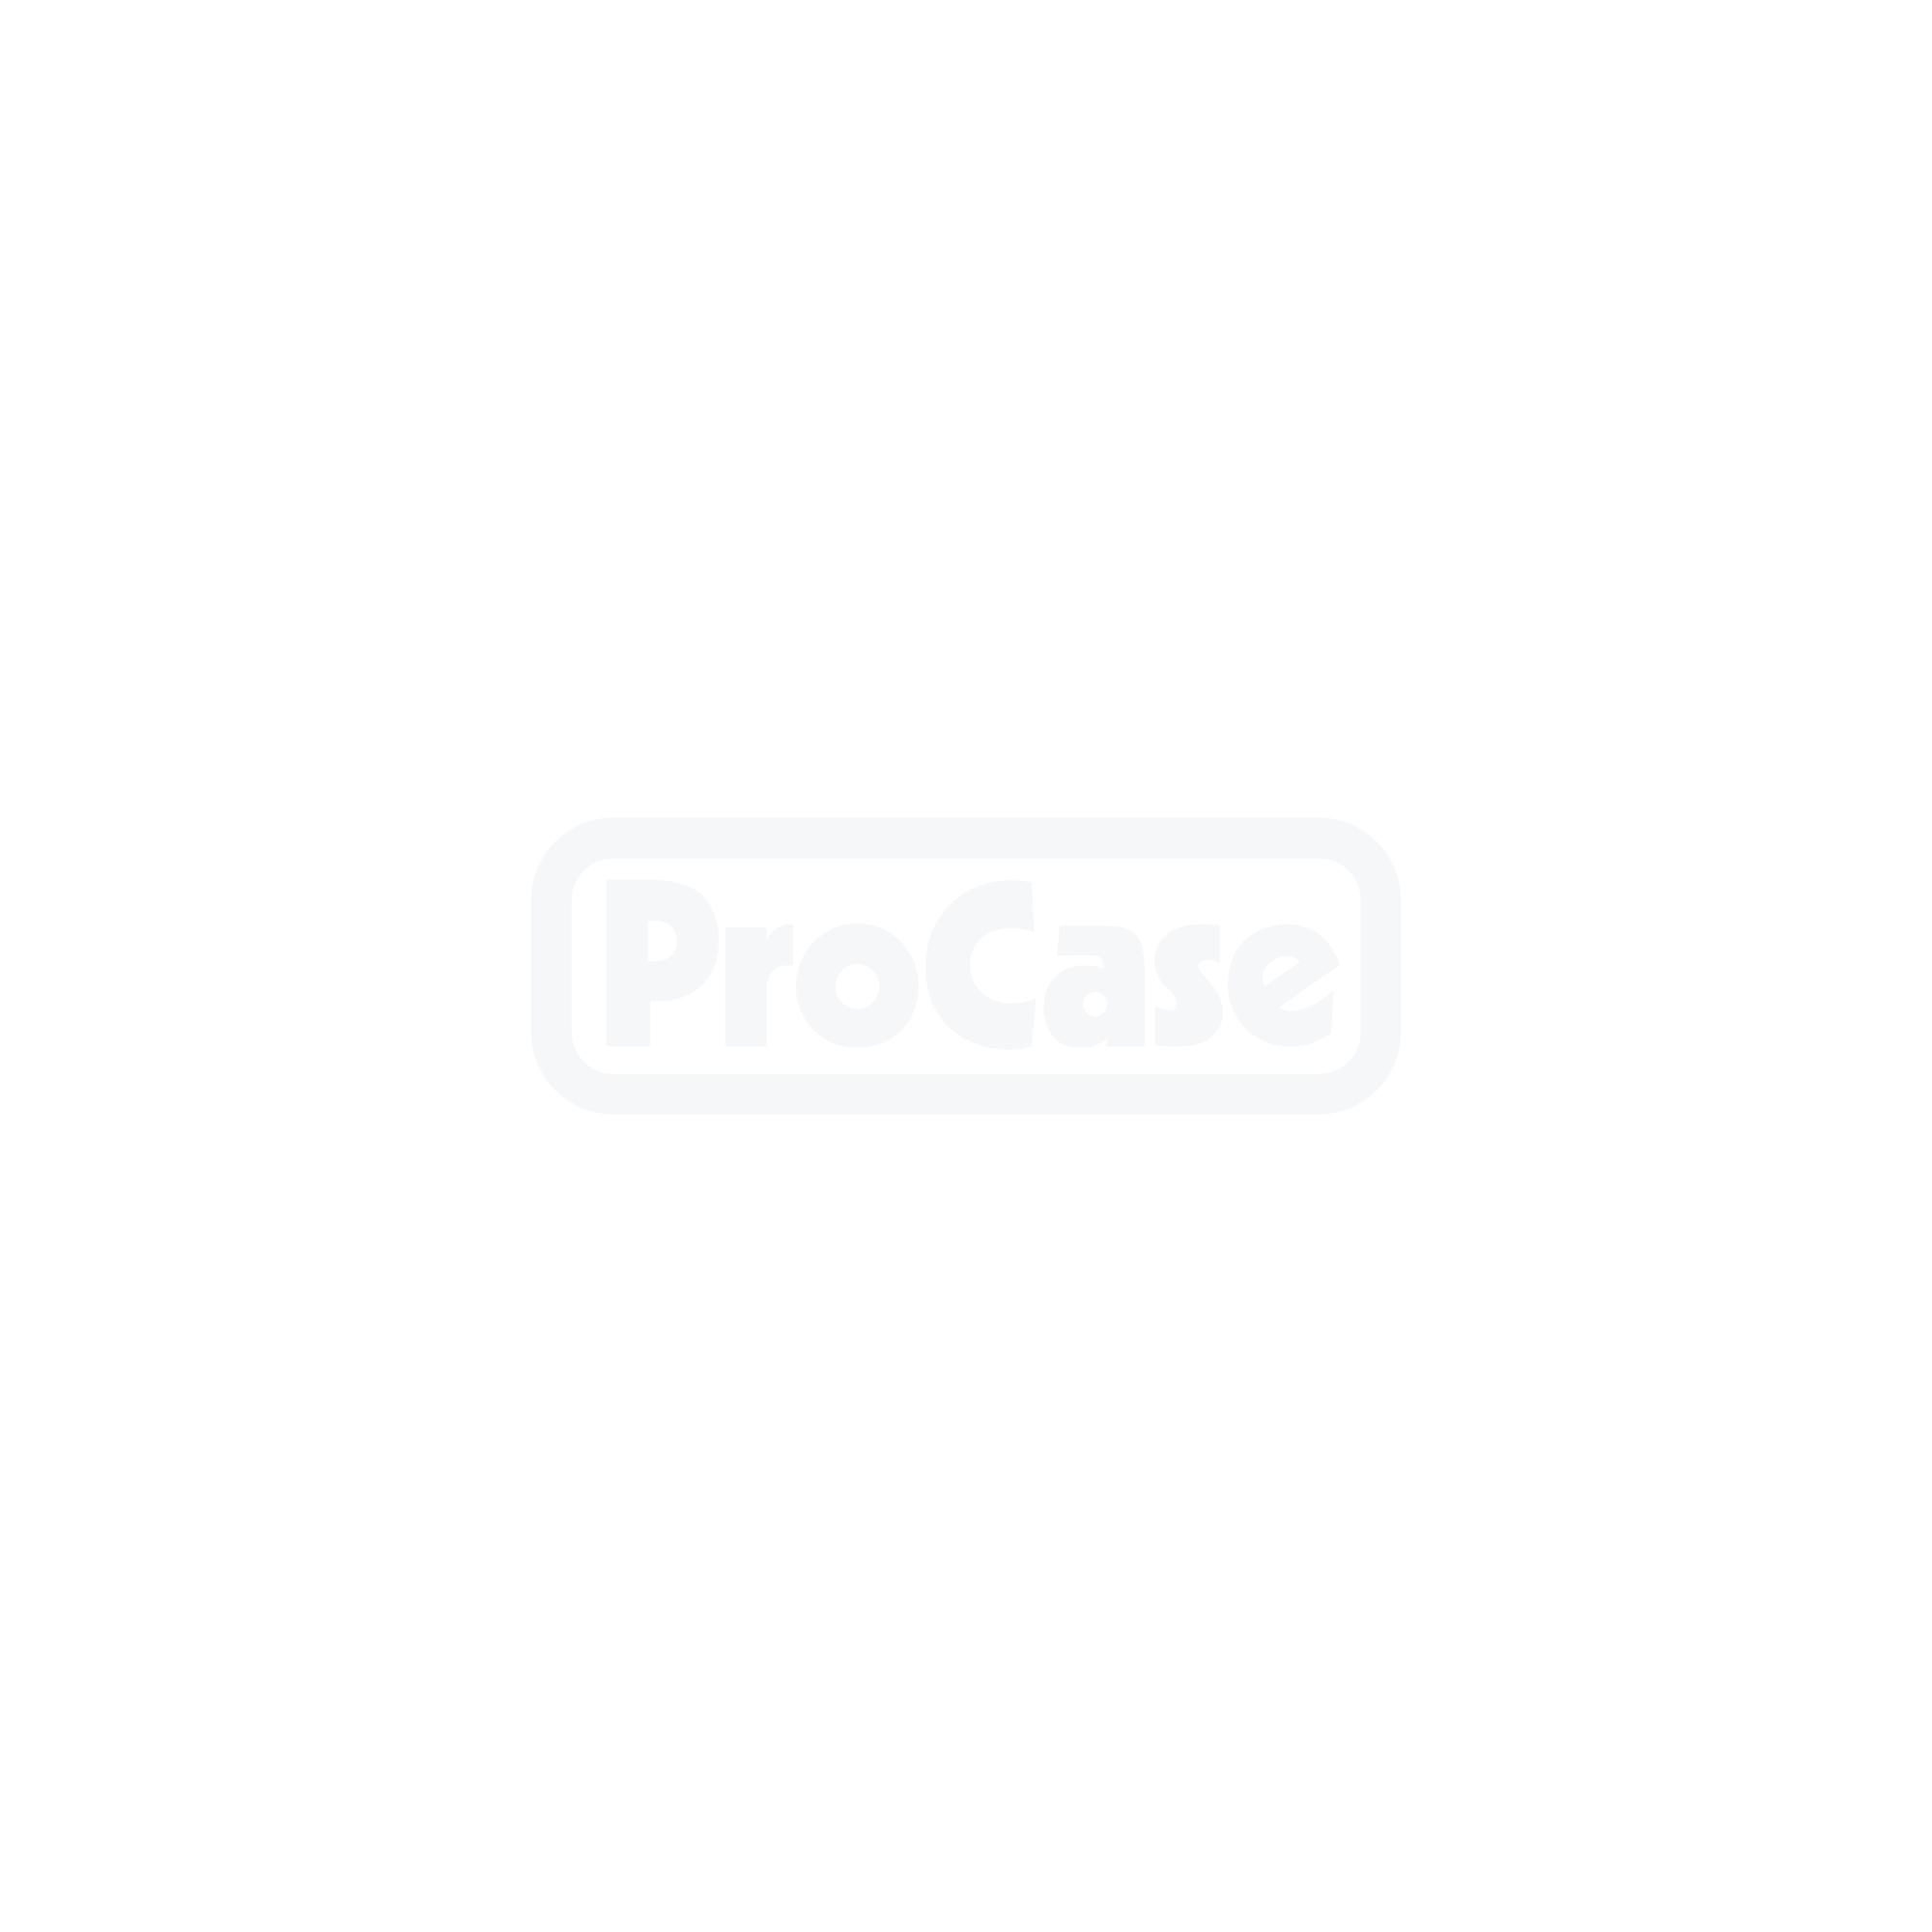 Flightcase für 6 Mikrofonstative + 6 Boxenstative